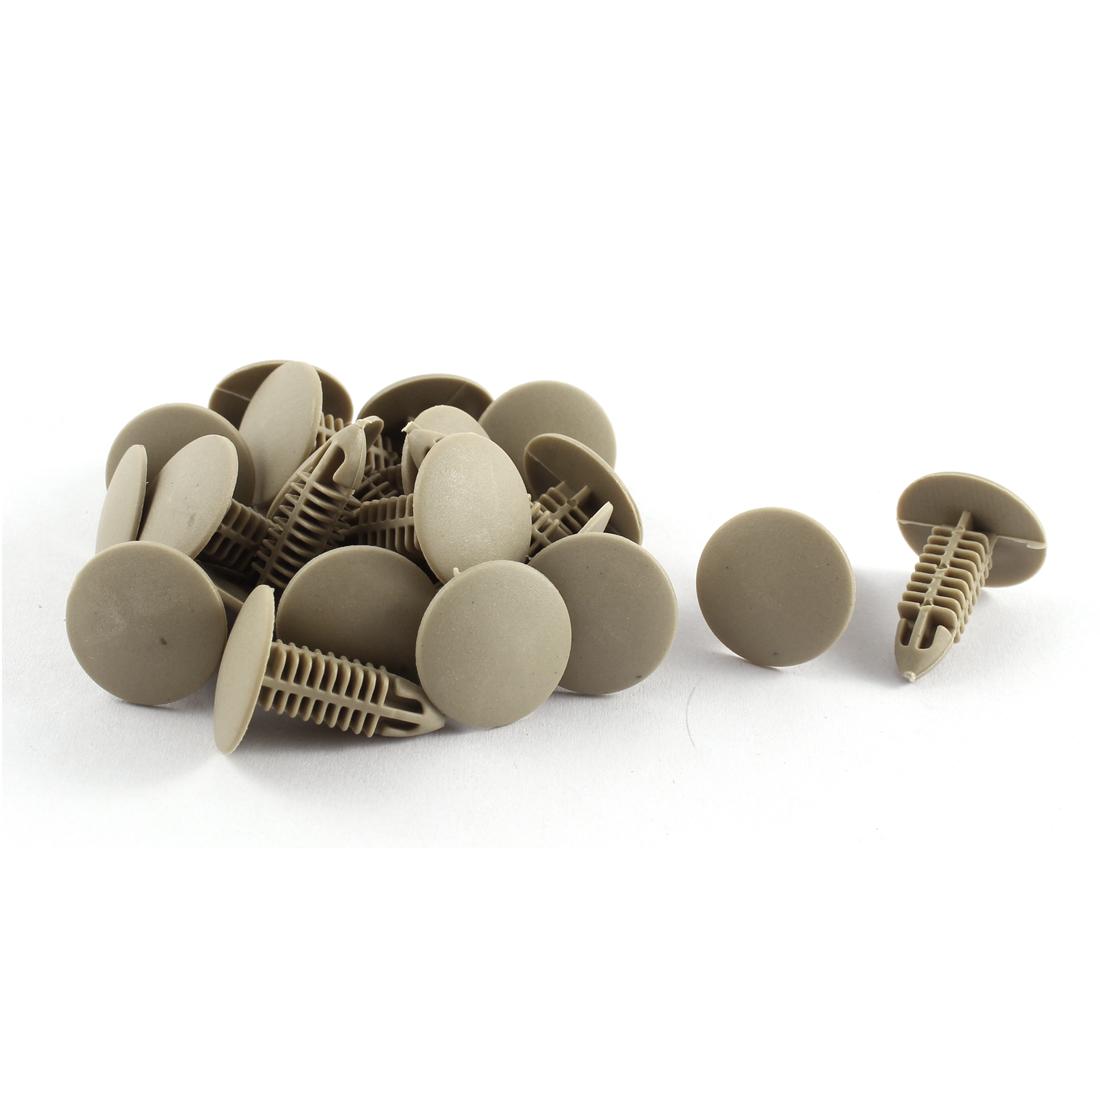 20 Pcs Khaki Plastic Splash Guard Moulding Rivet Clips 6mm x 17mm x 20mm